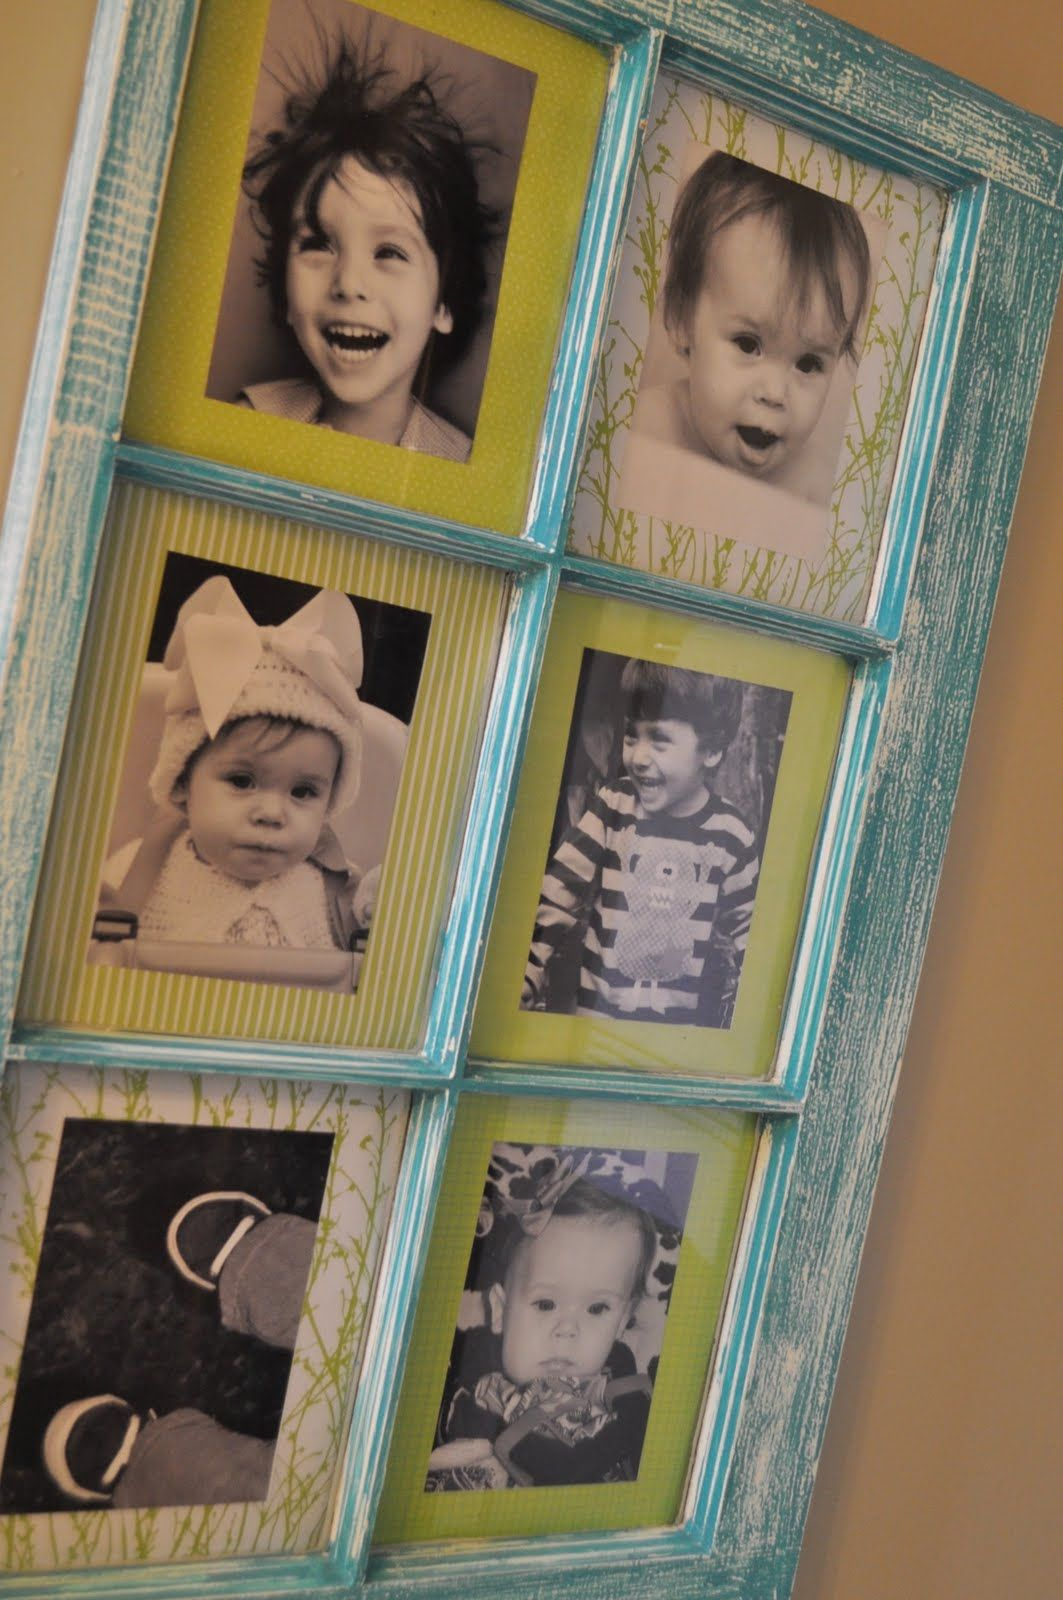 old window pane | Wall Decals & Decor Ideas | Pinterest ...